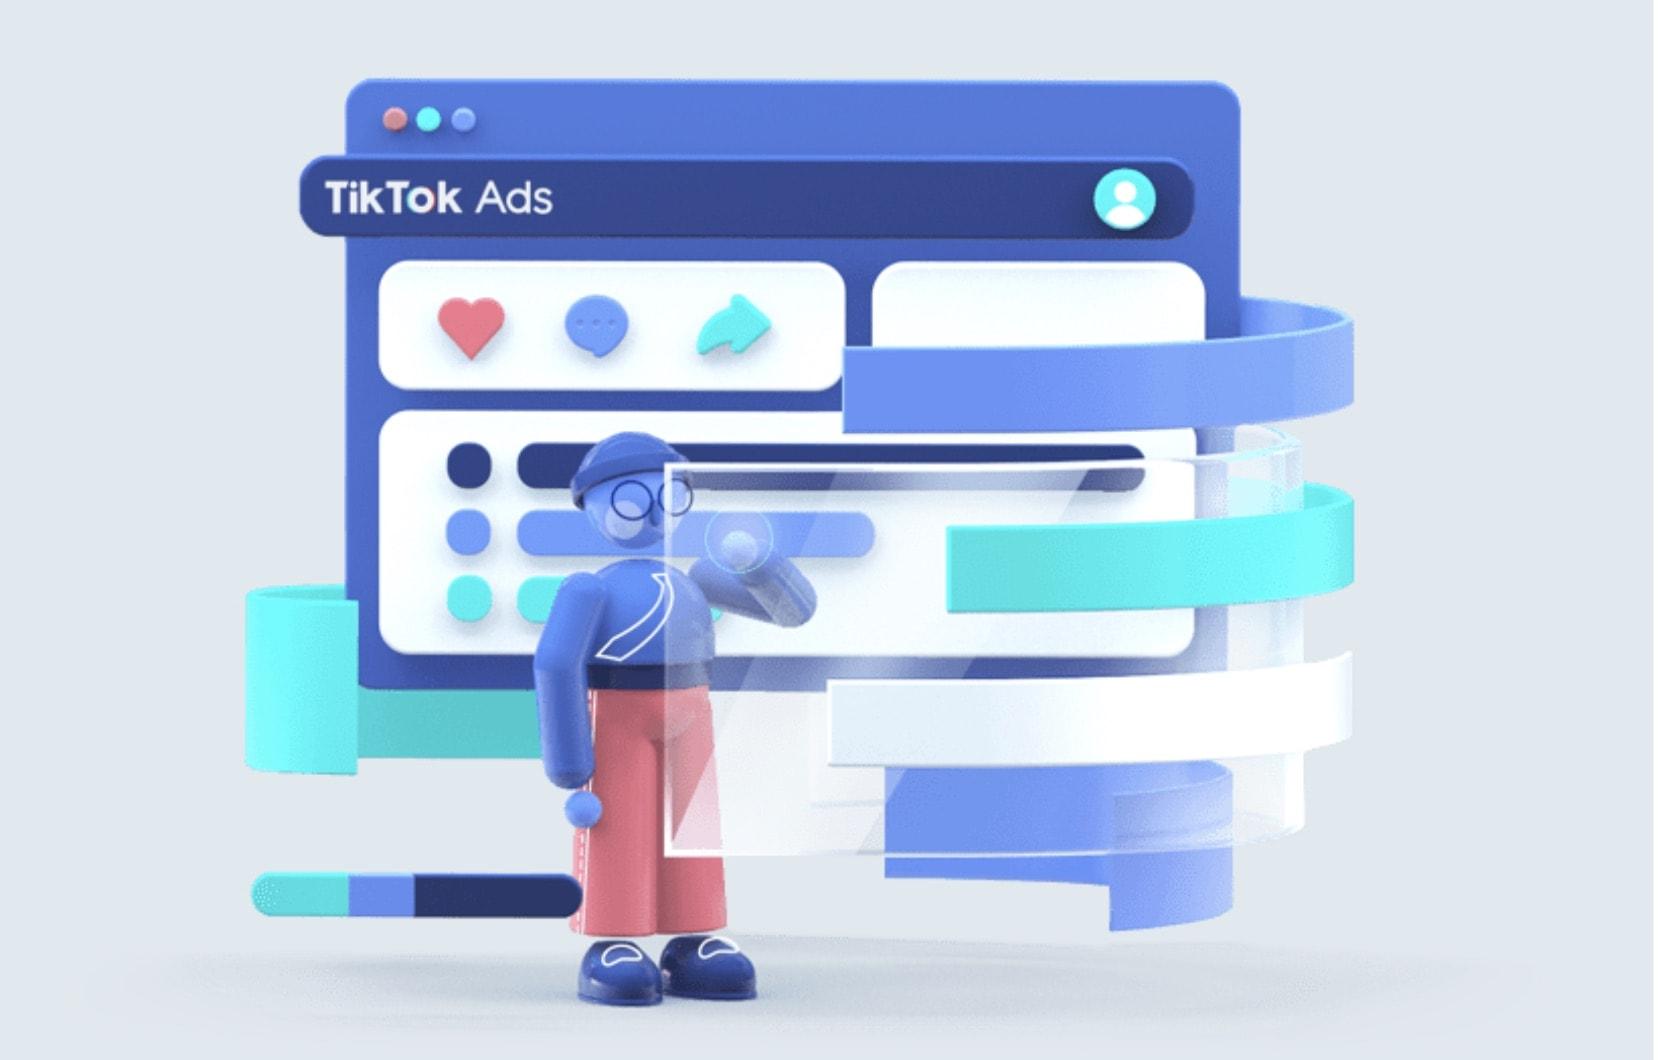 TikTok Marketing: A New Avenue For Business Promotion